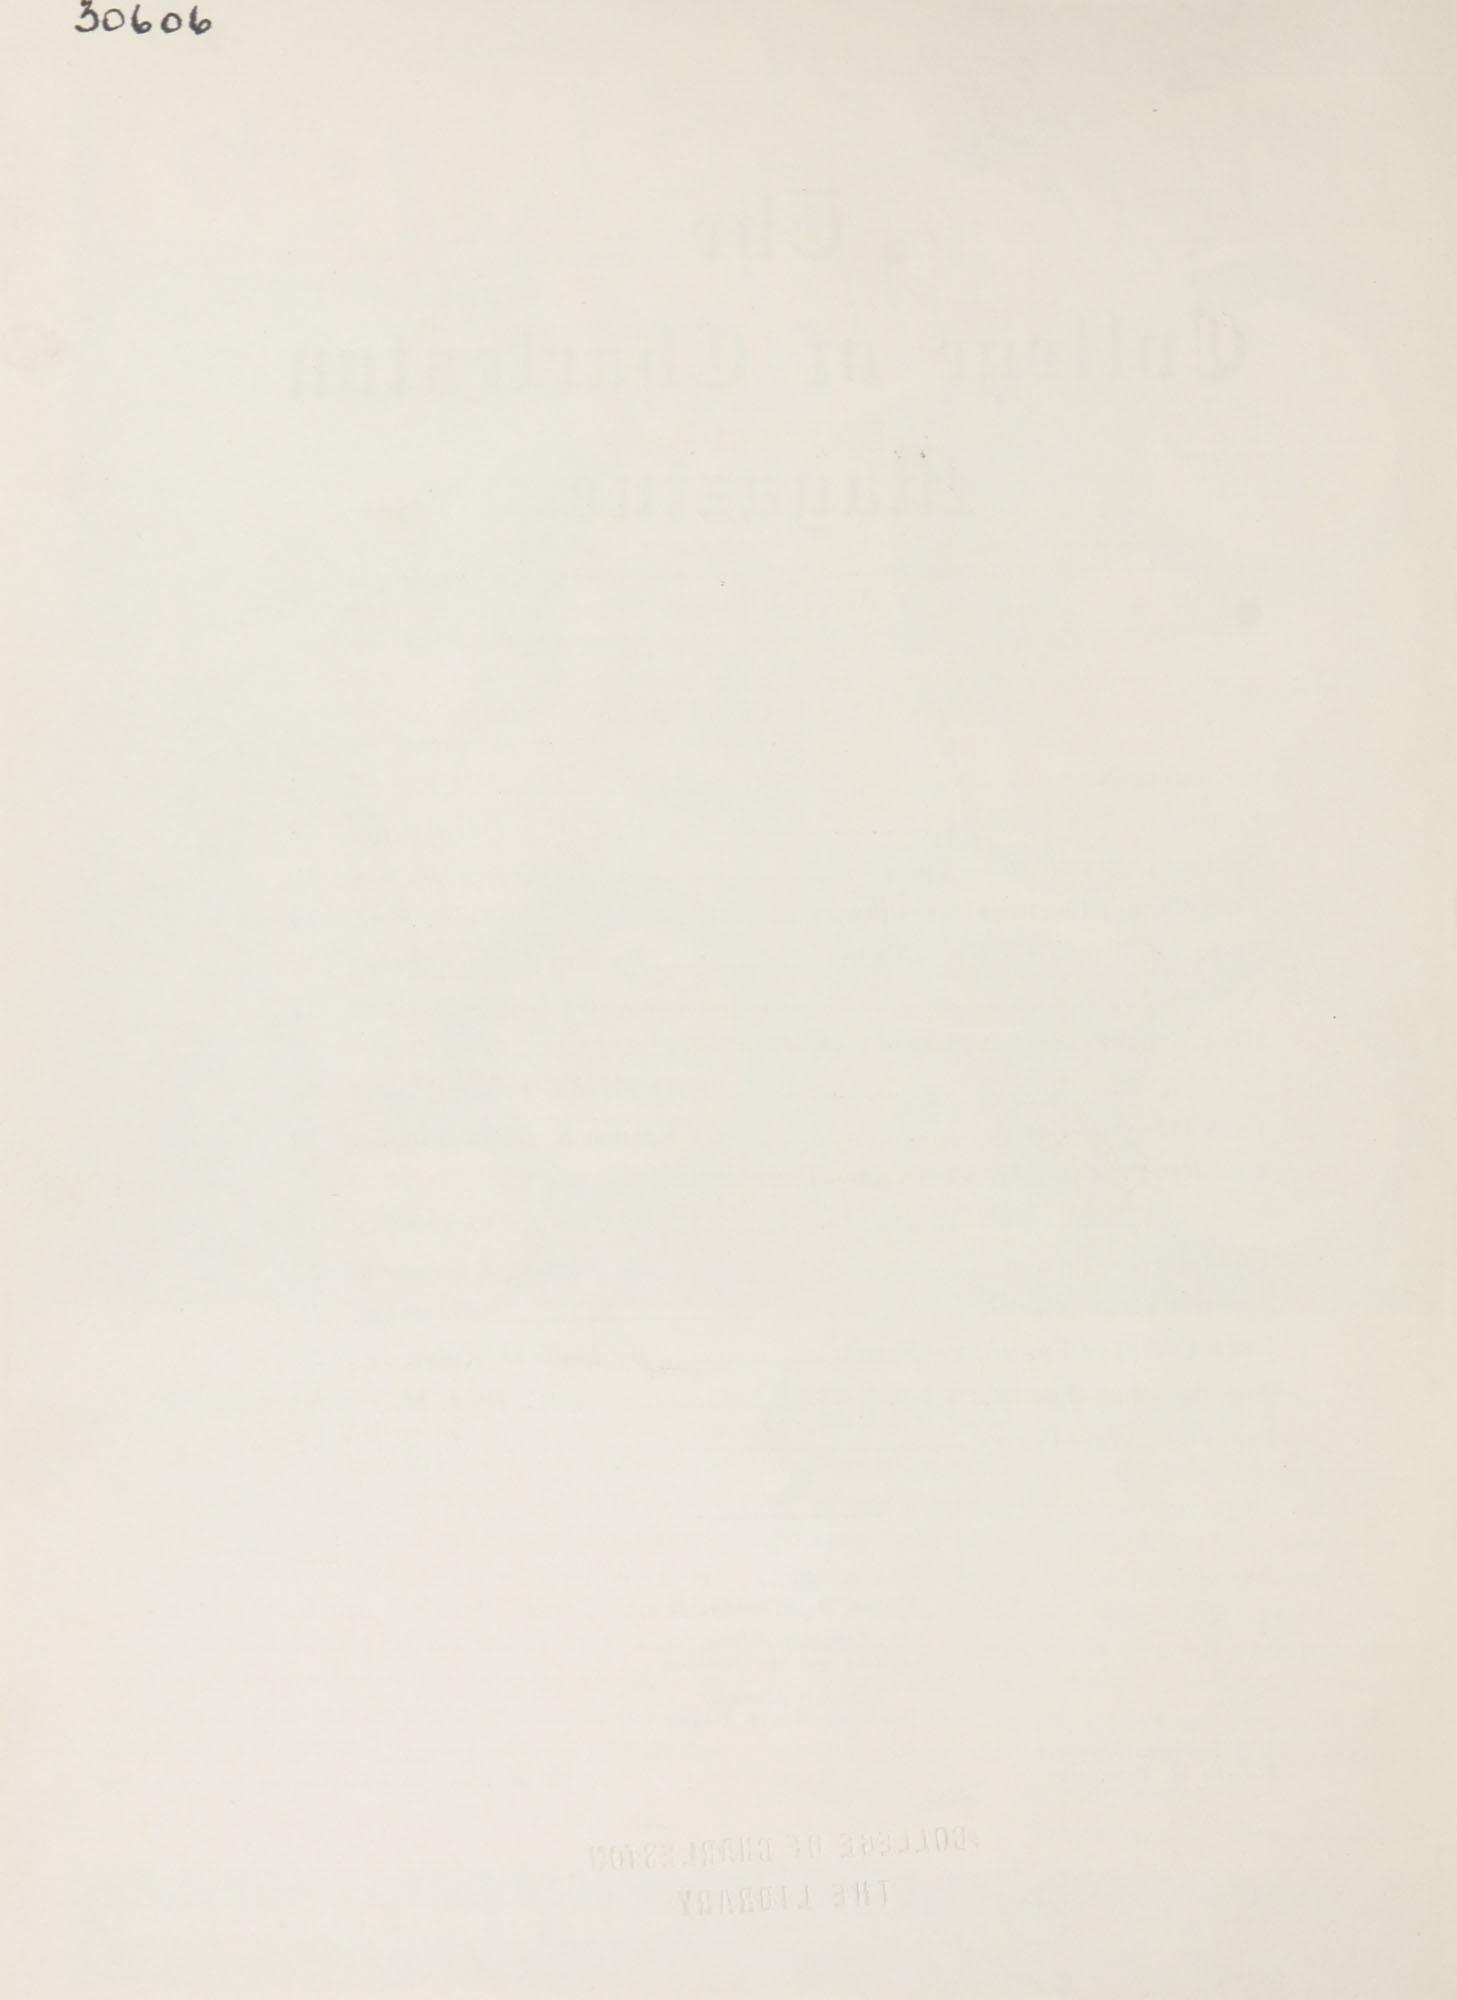 College of Charleston Magazine, 1941-1942, Vol. 45 No. 1, blank page